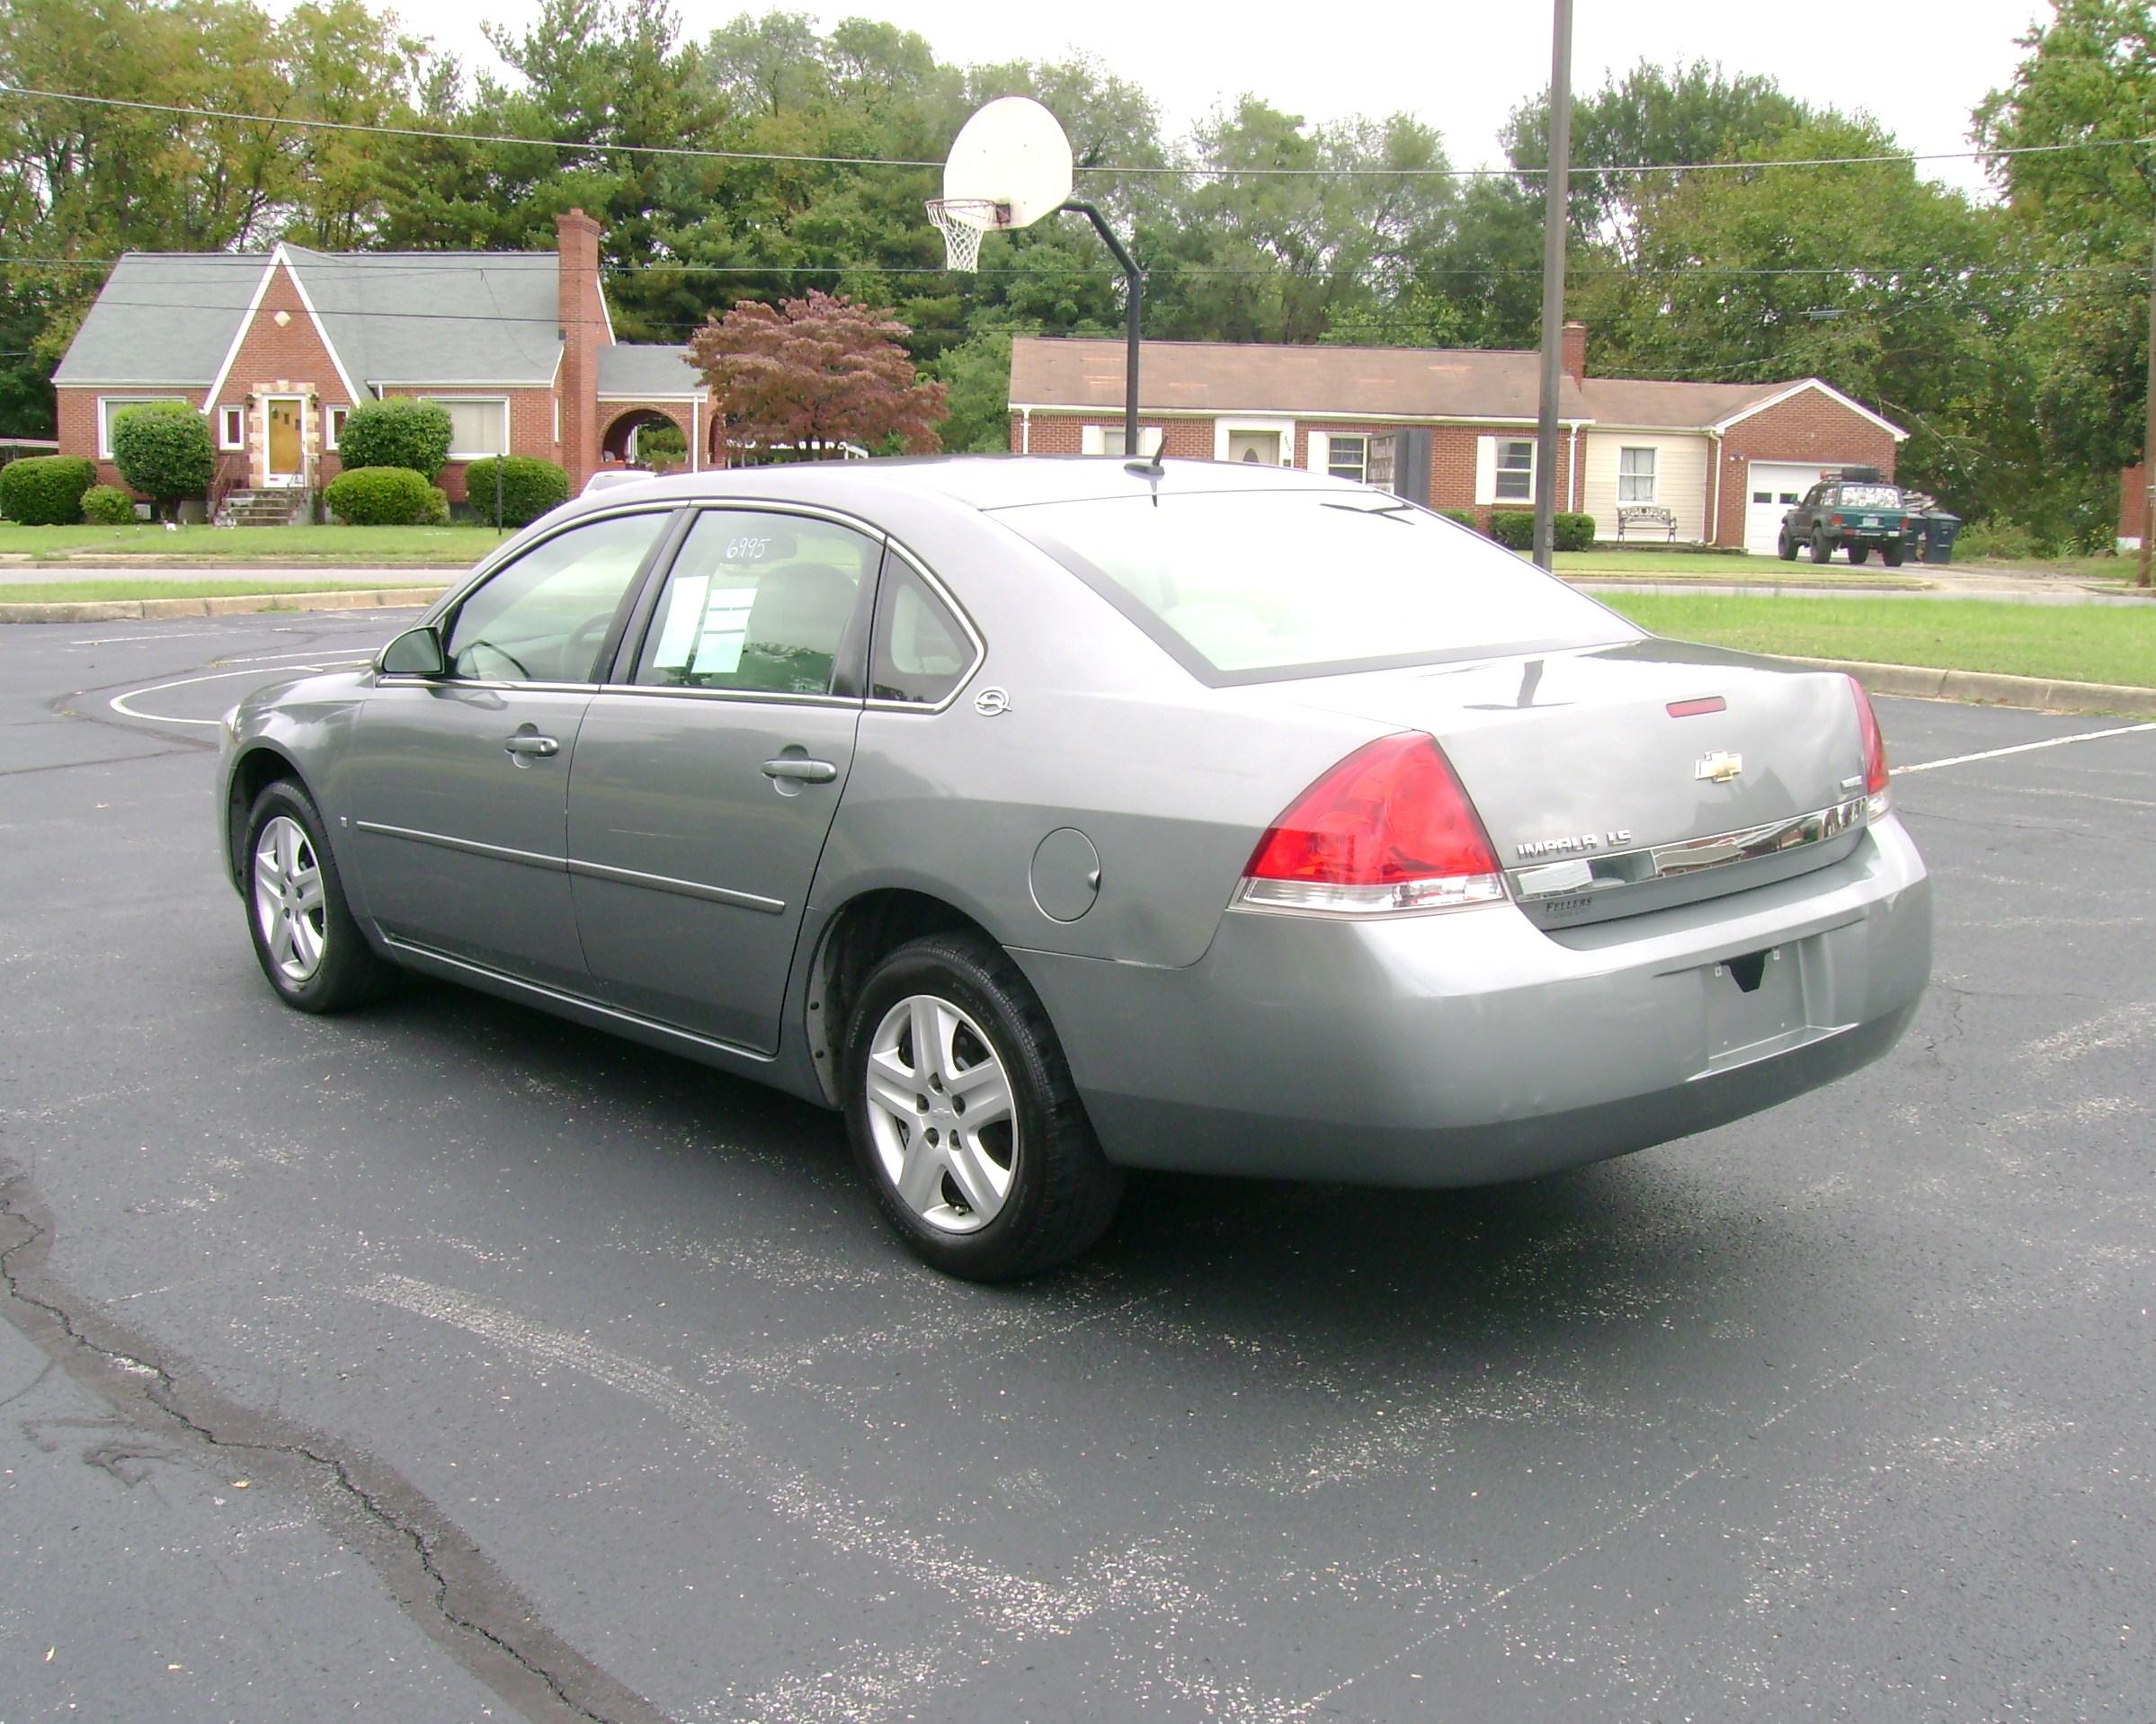 2007 Chevrolet Impala Ls 007 2007 Chevrolet Impala Ls 007 Automobile Exchange